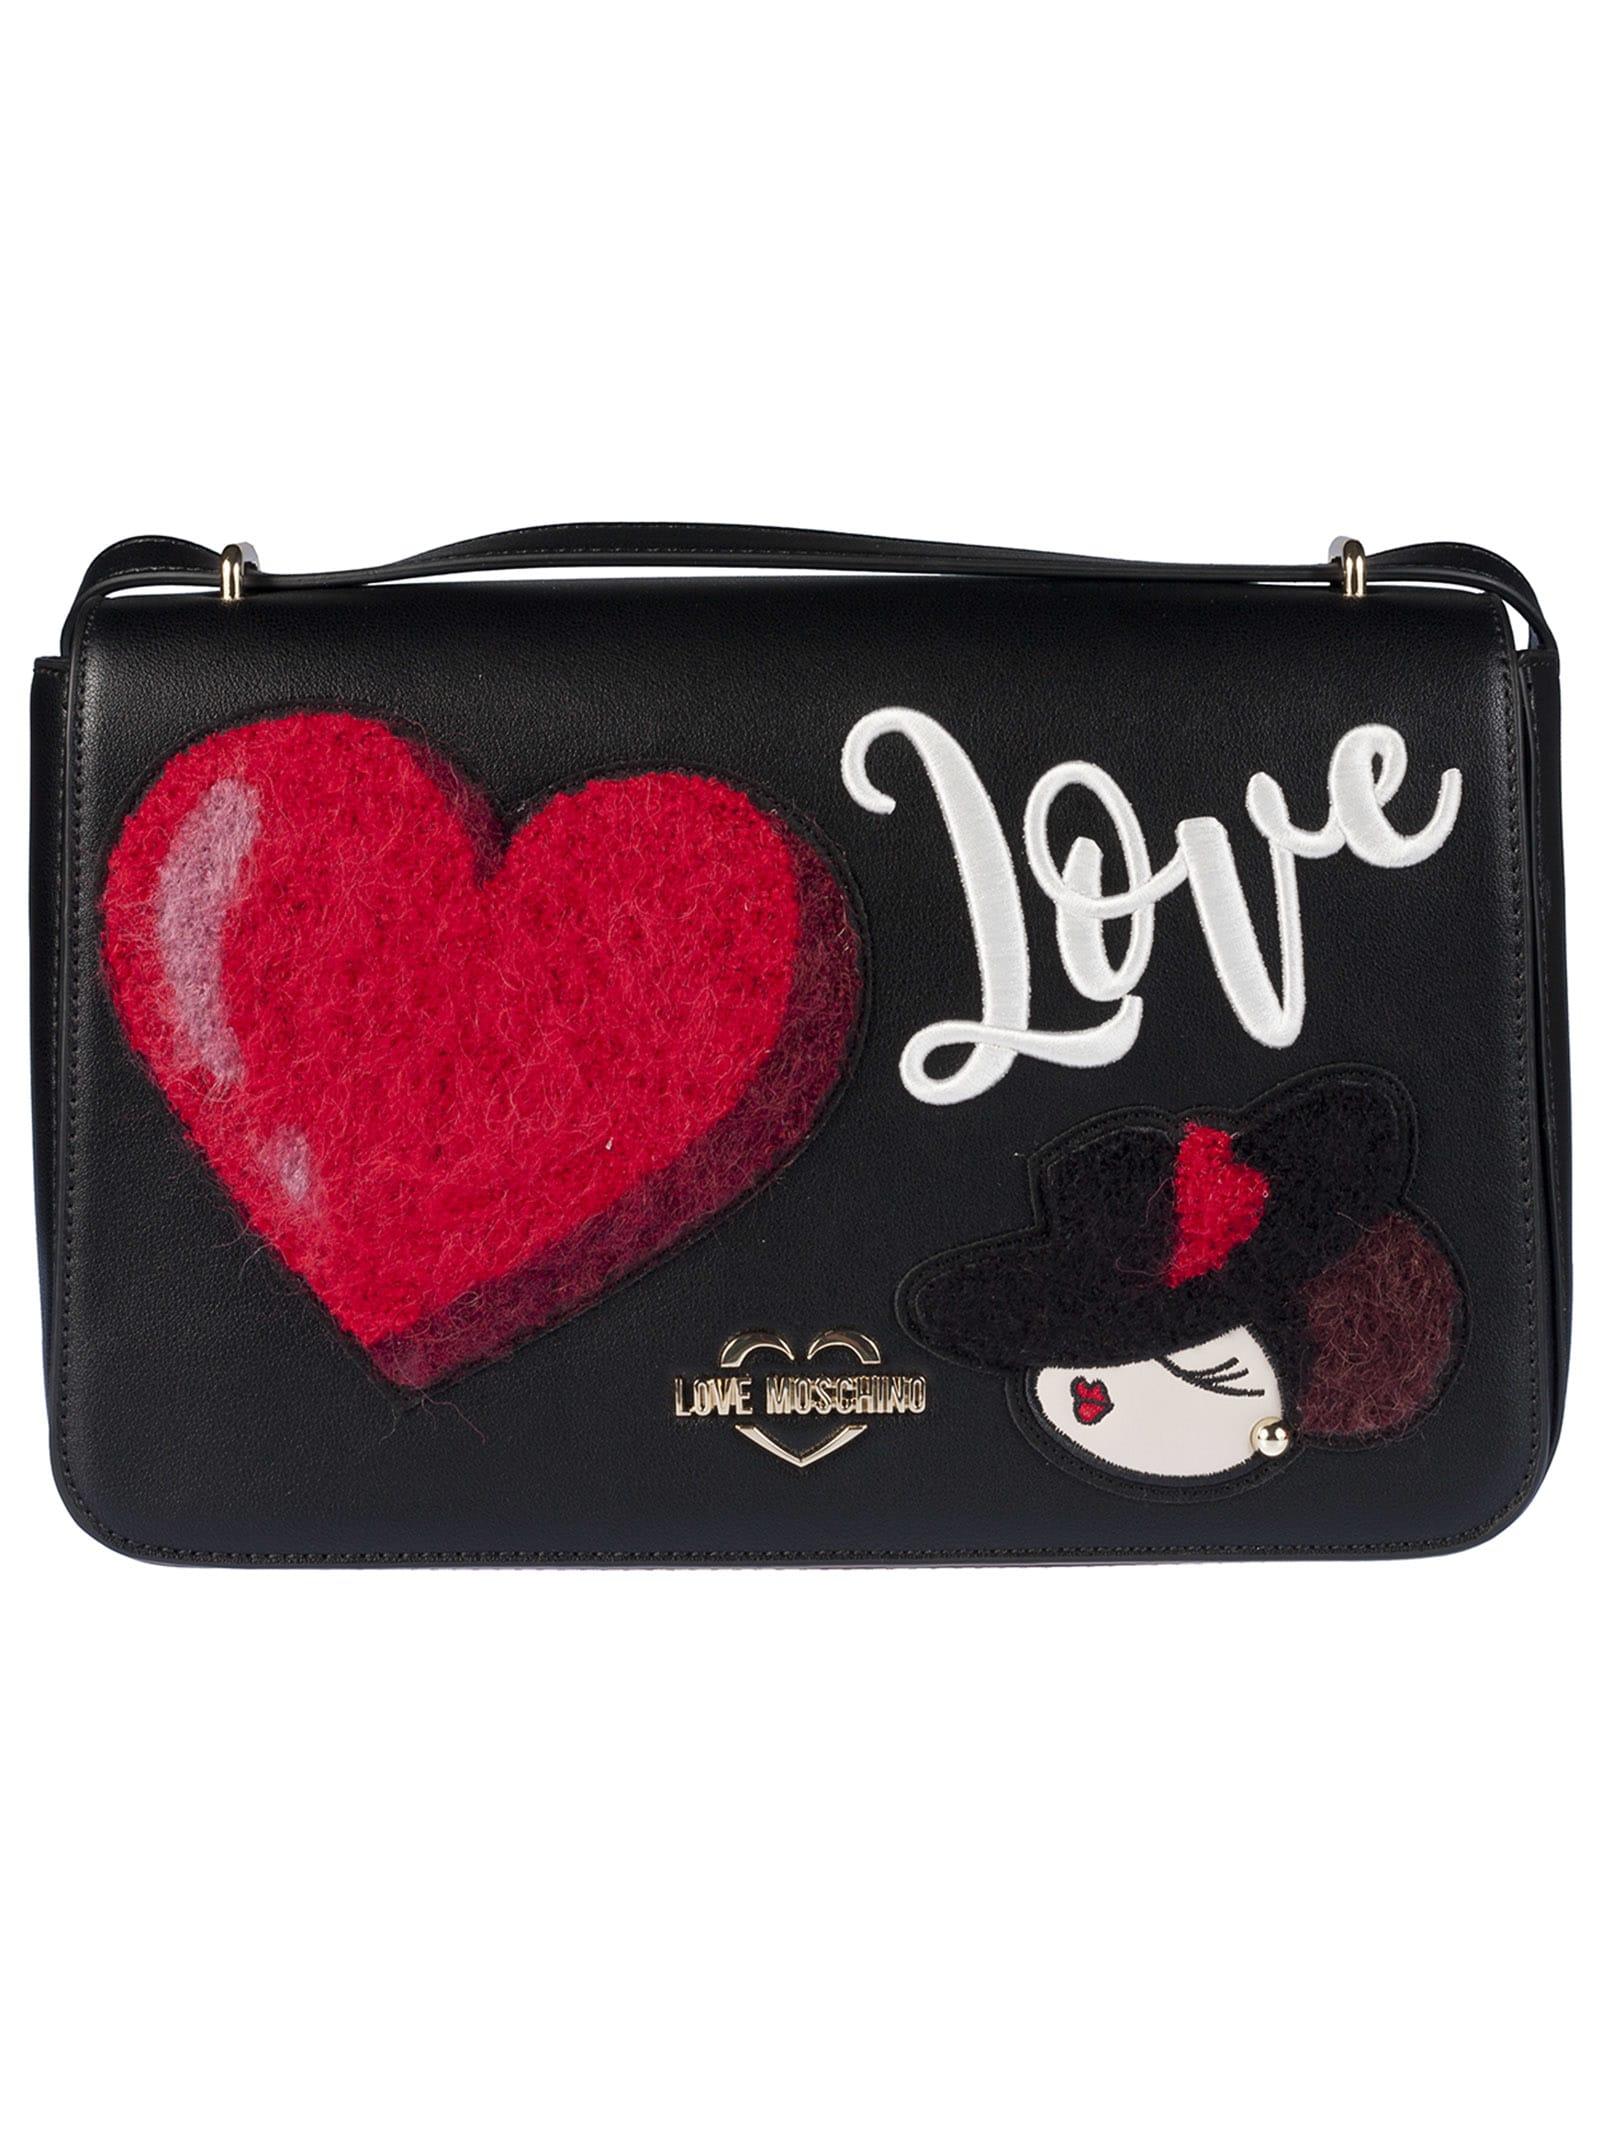 sale retailer 842a2 071a7 Love Moschino Foldover Shoulder Bag